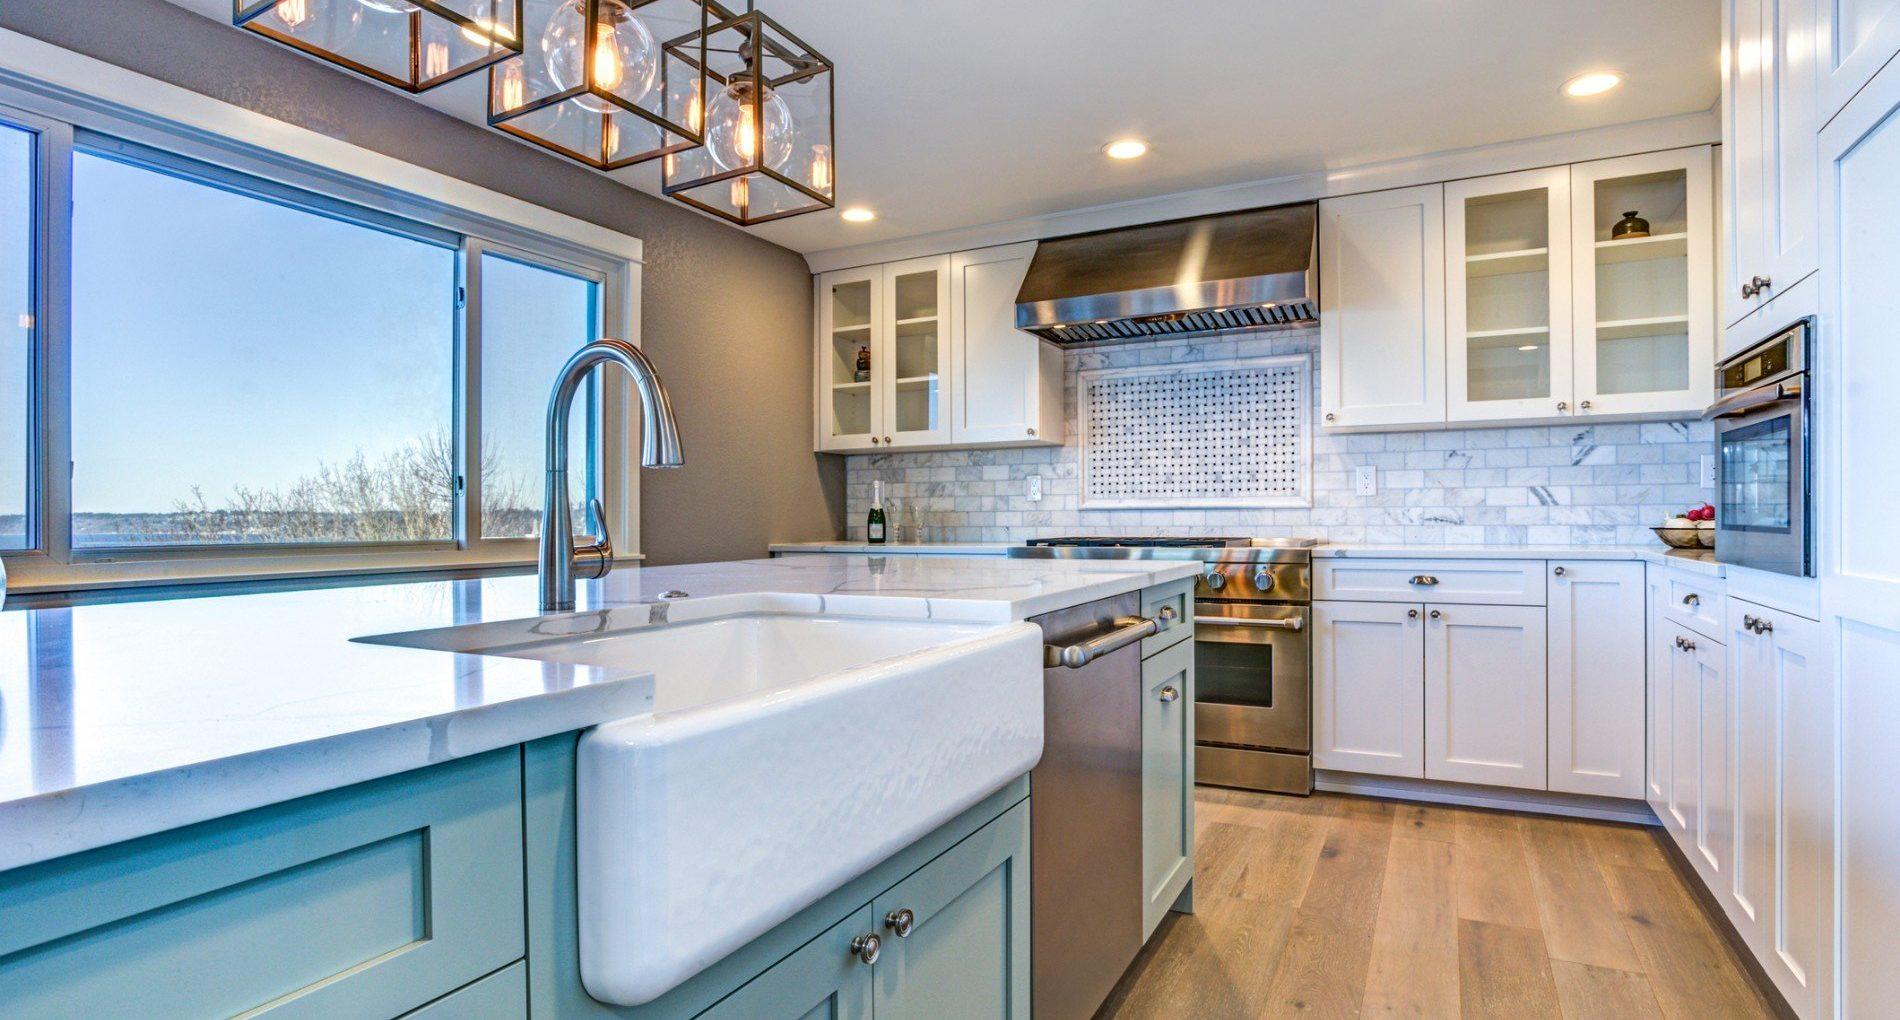 Bringing Blue into Your Delta Kitchen